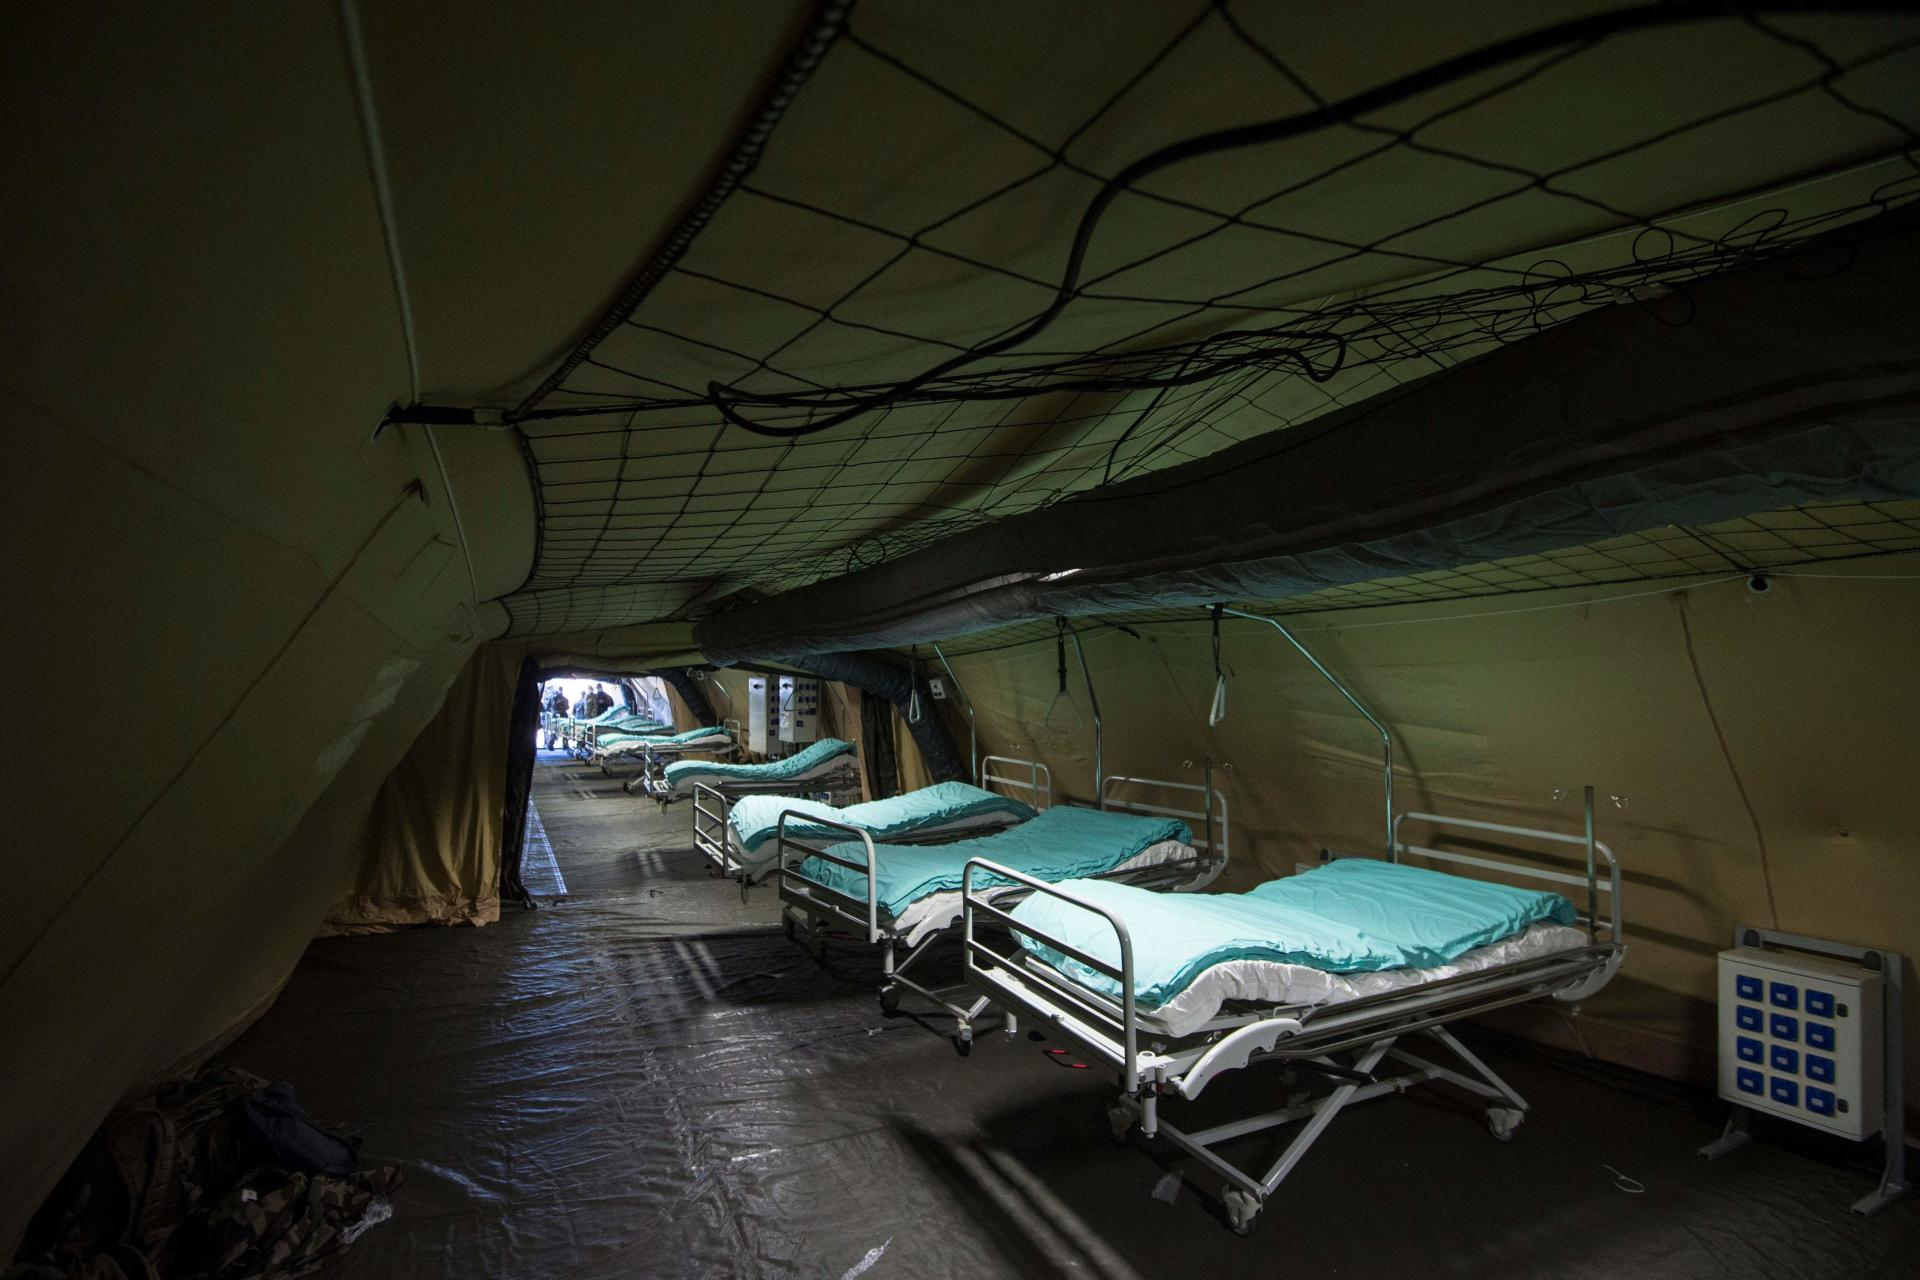 Les lits installés dans l'hôpital de campagne, le 22 mars.